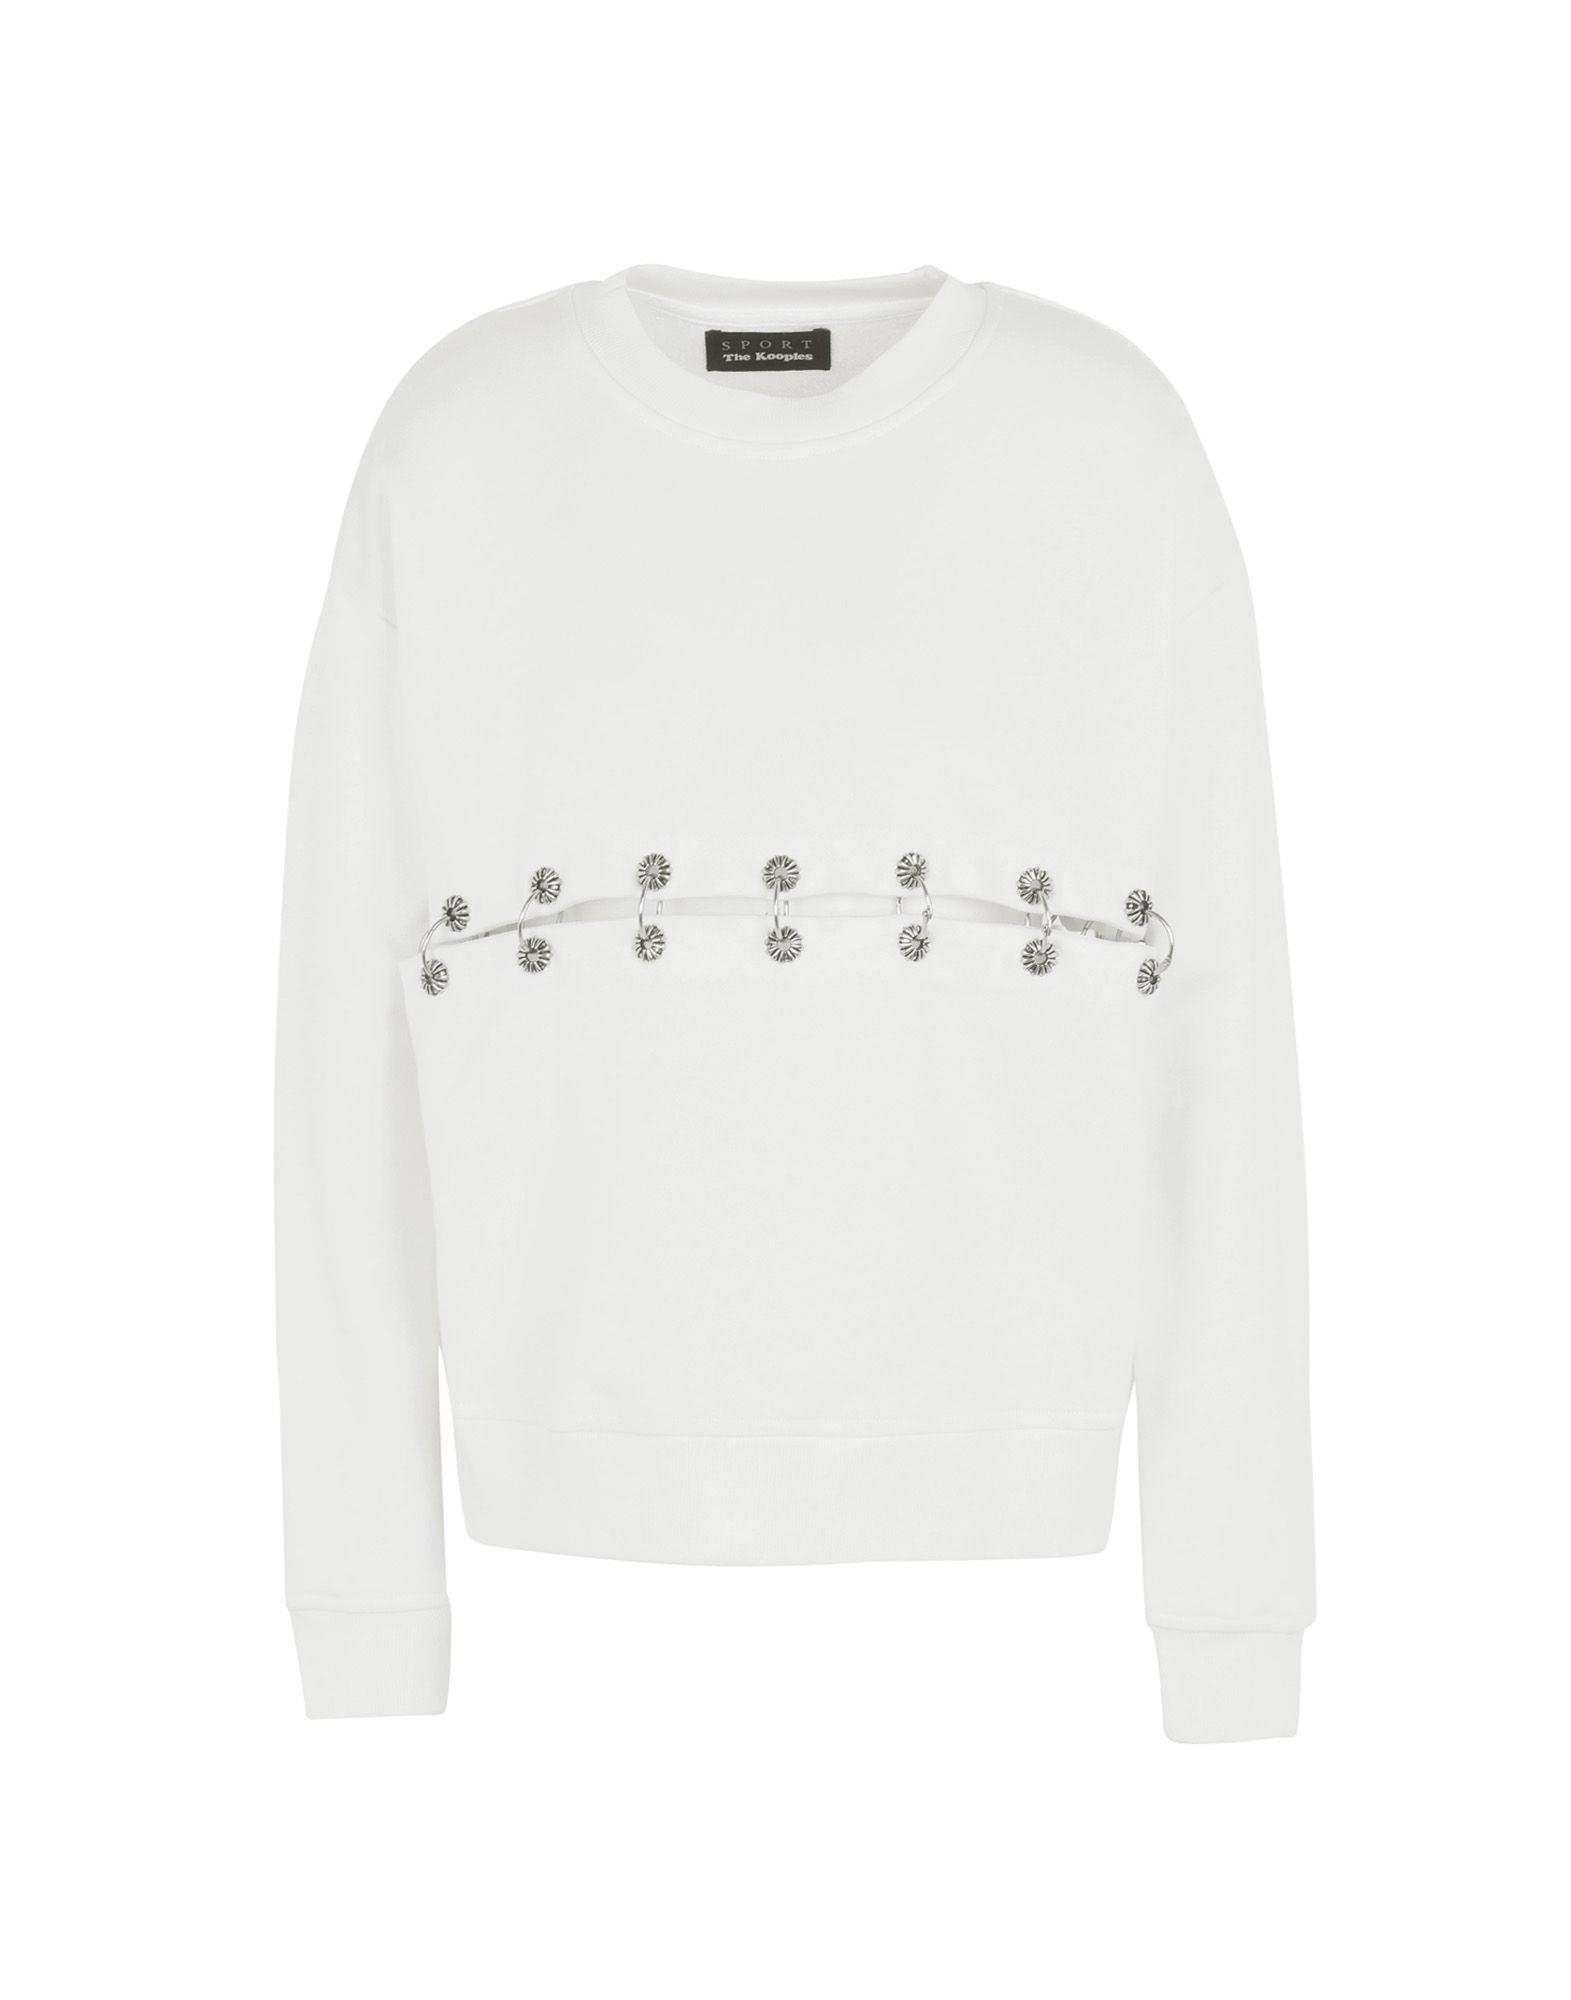 Felpa The Kooples Sport Fleece Sweater With Eyelets - Donna - Acquista online su RgbhDio1R